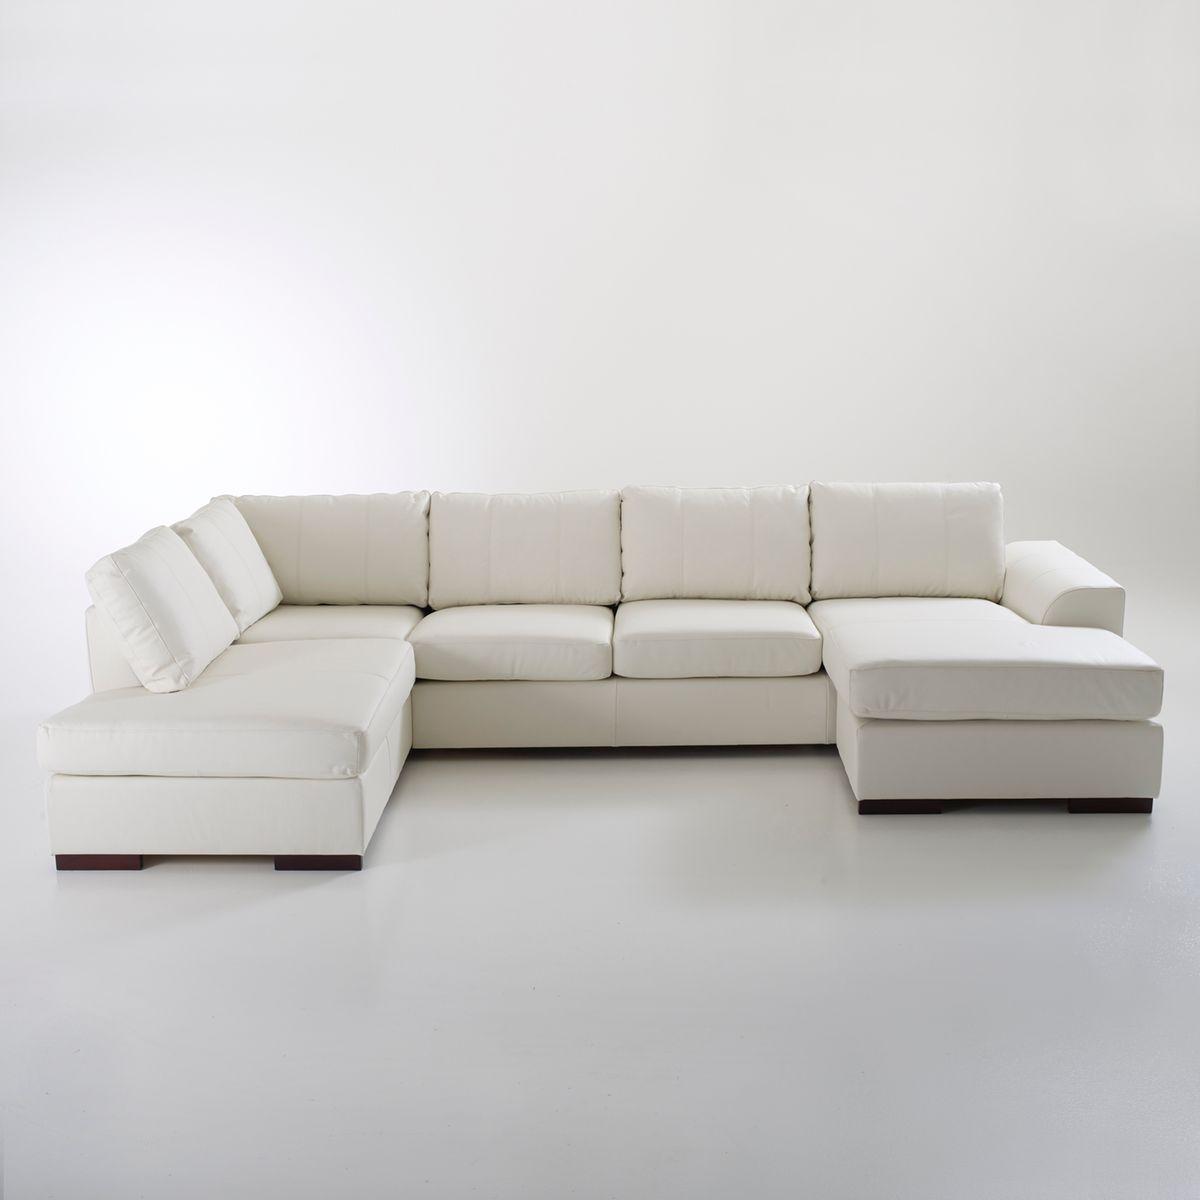 canap d 39 angle cuir vachette portland. Black Bedroom Furniture Sets. Home Design Ideas